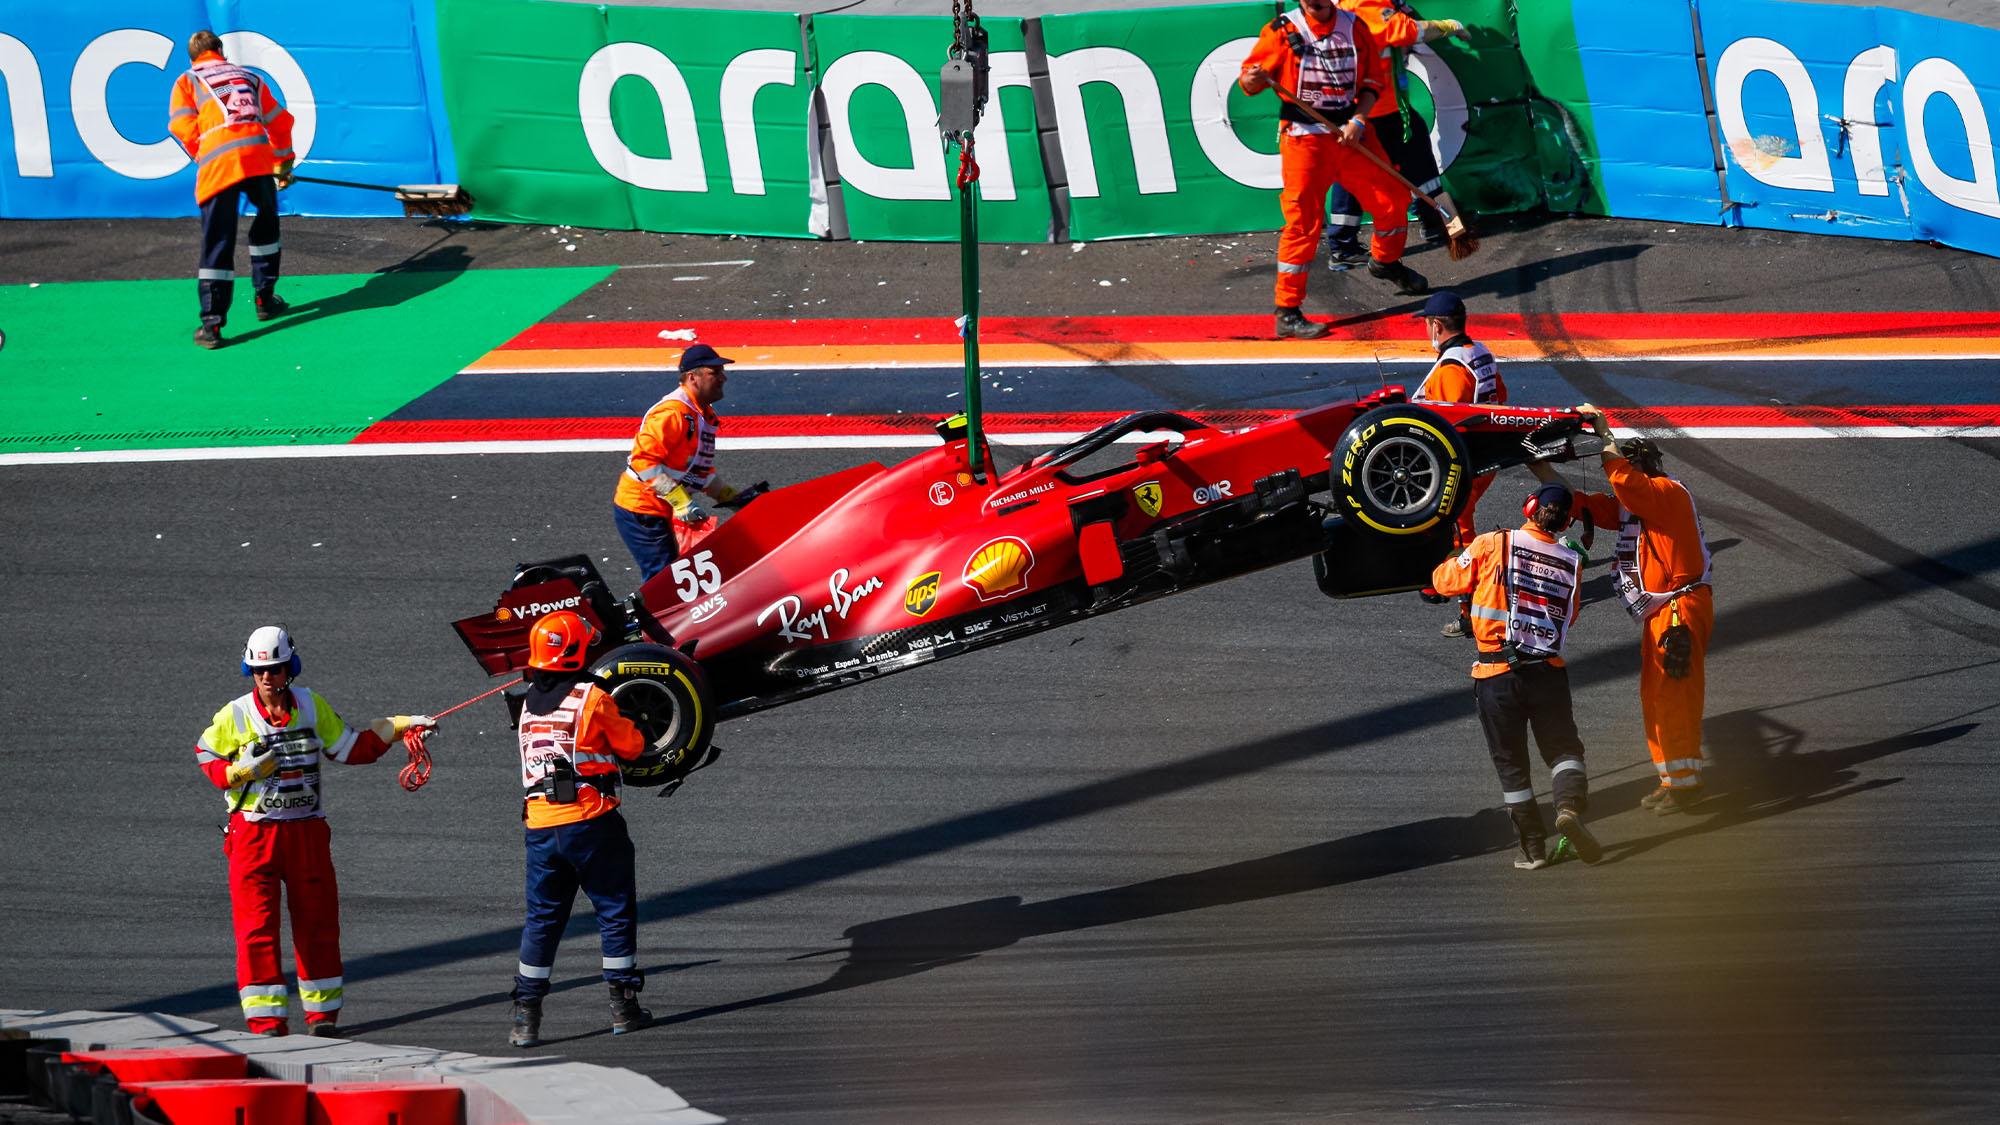 Sainz crash